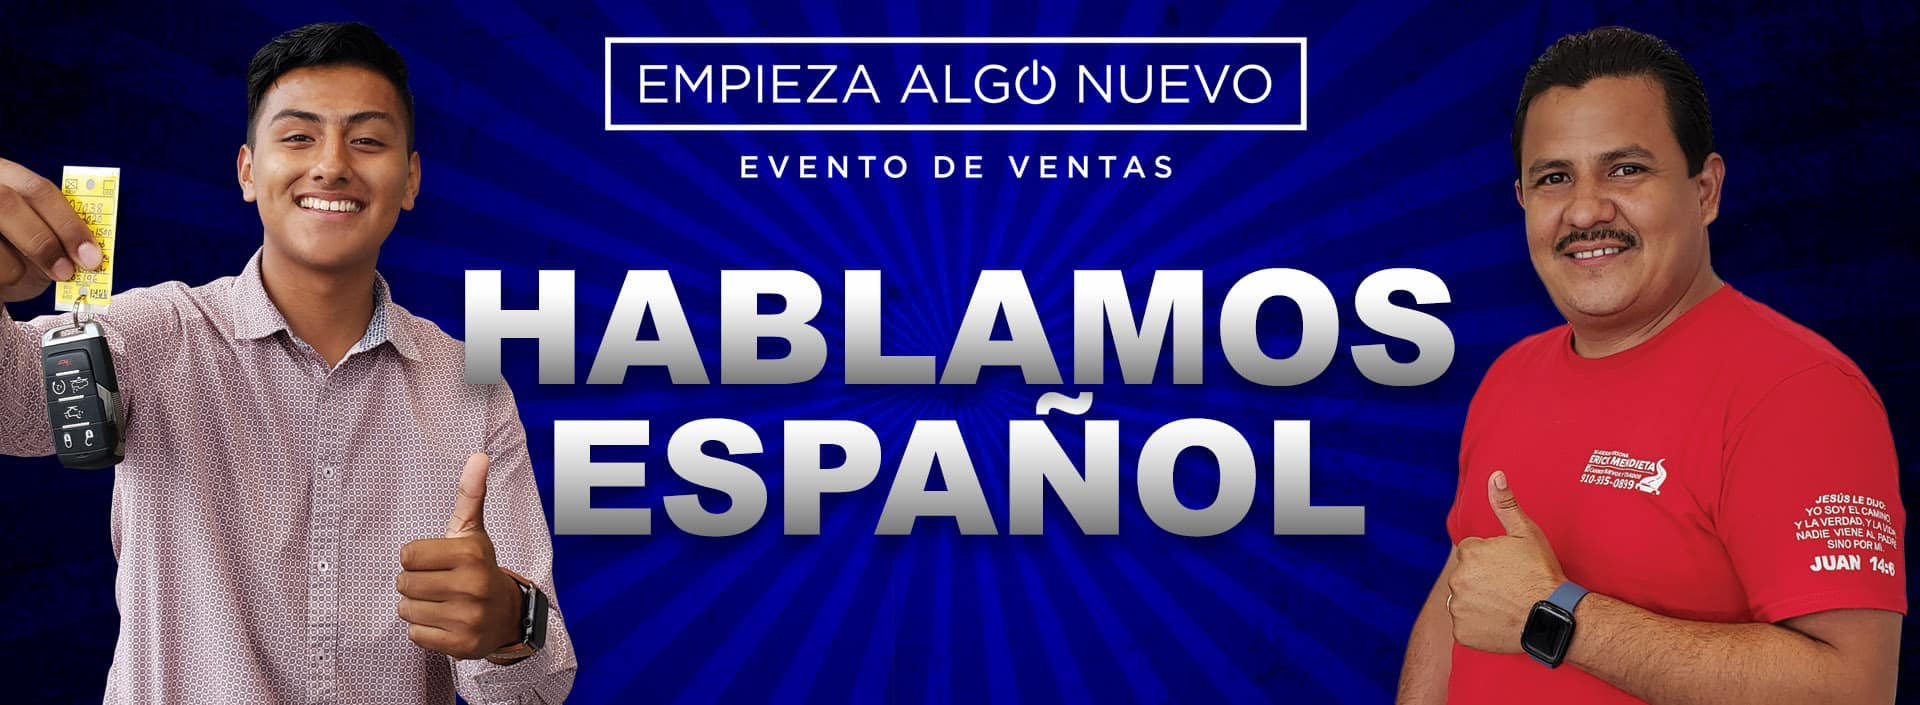 Hablomos Espanol